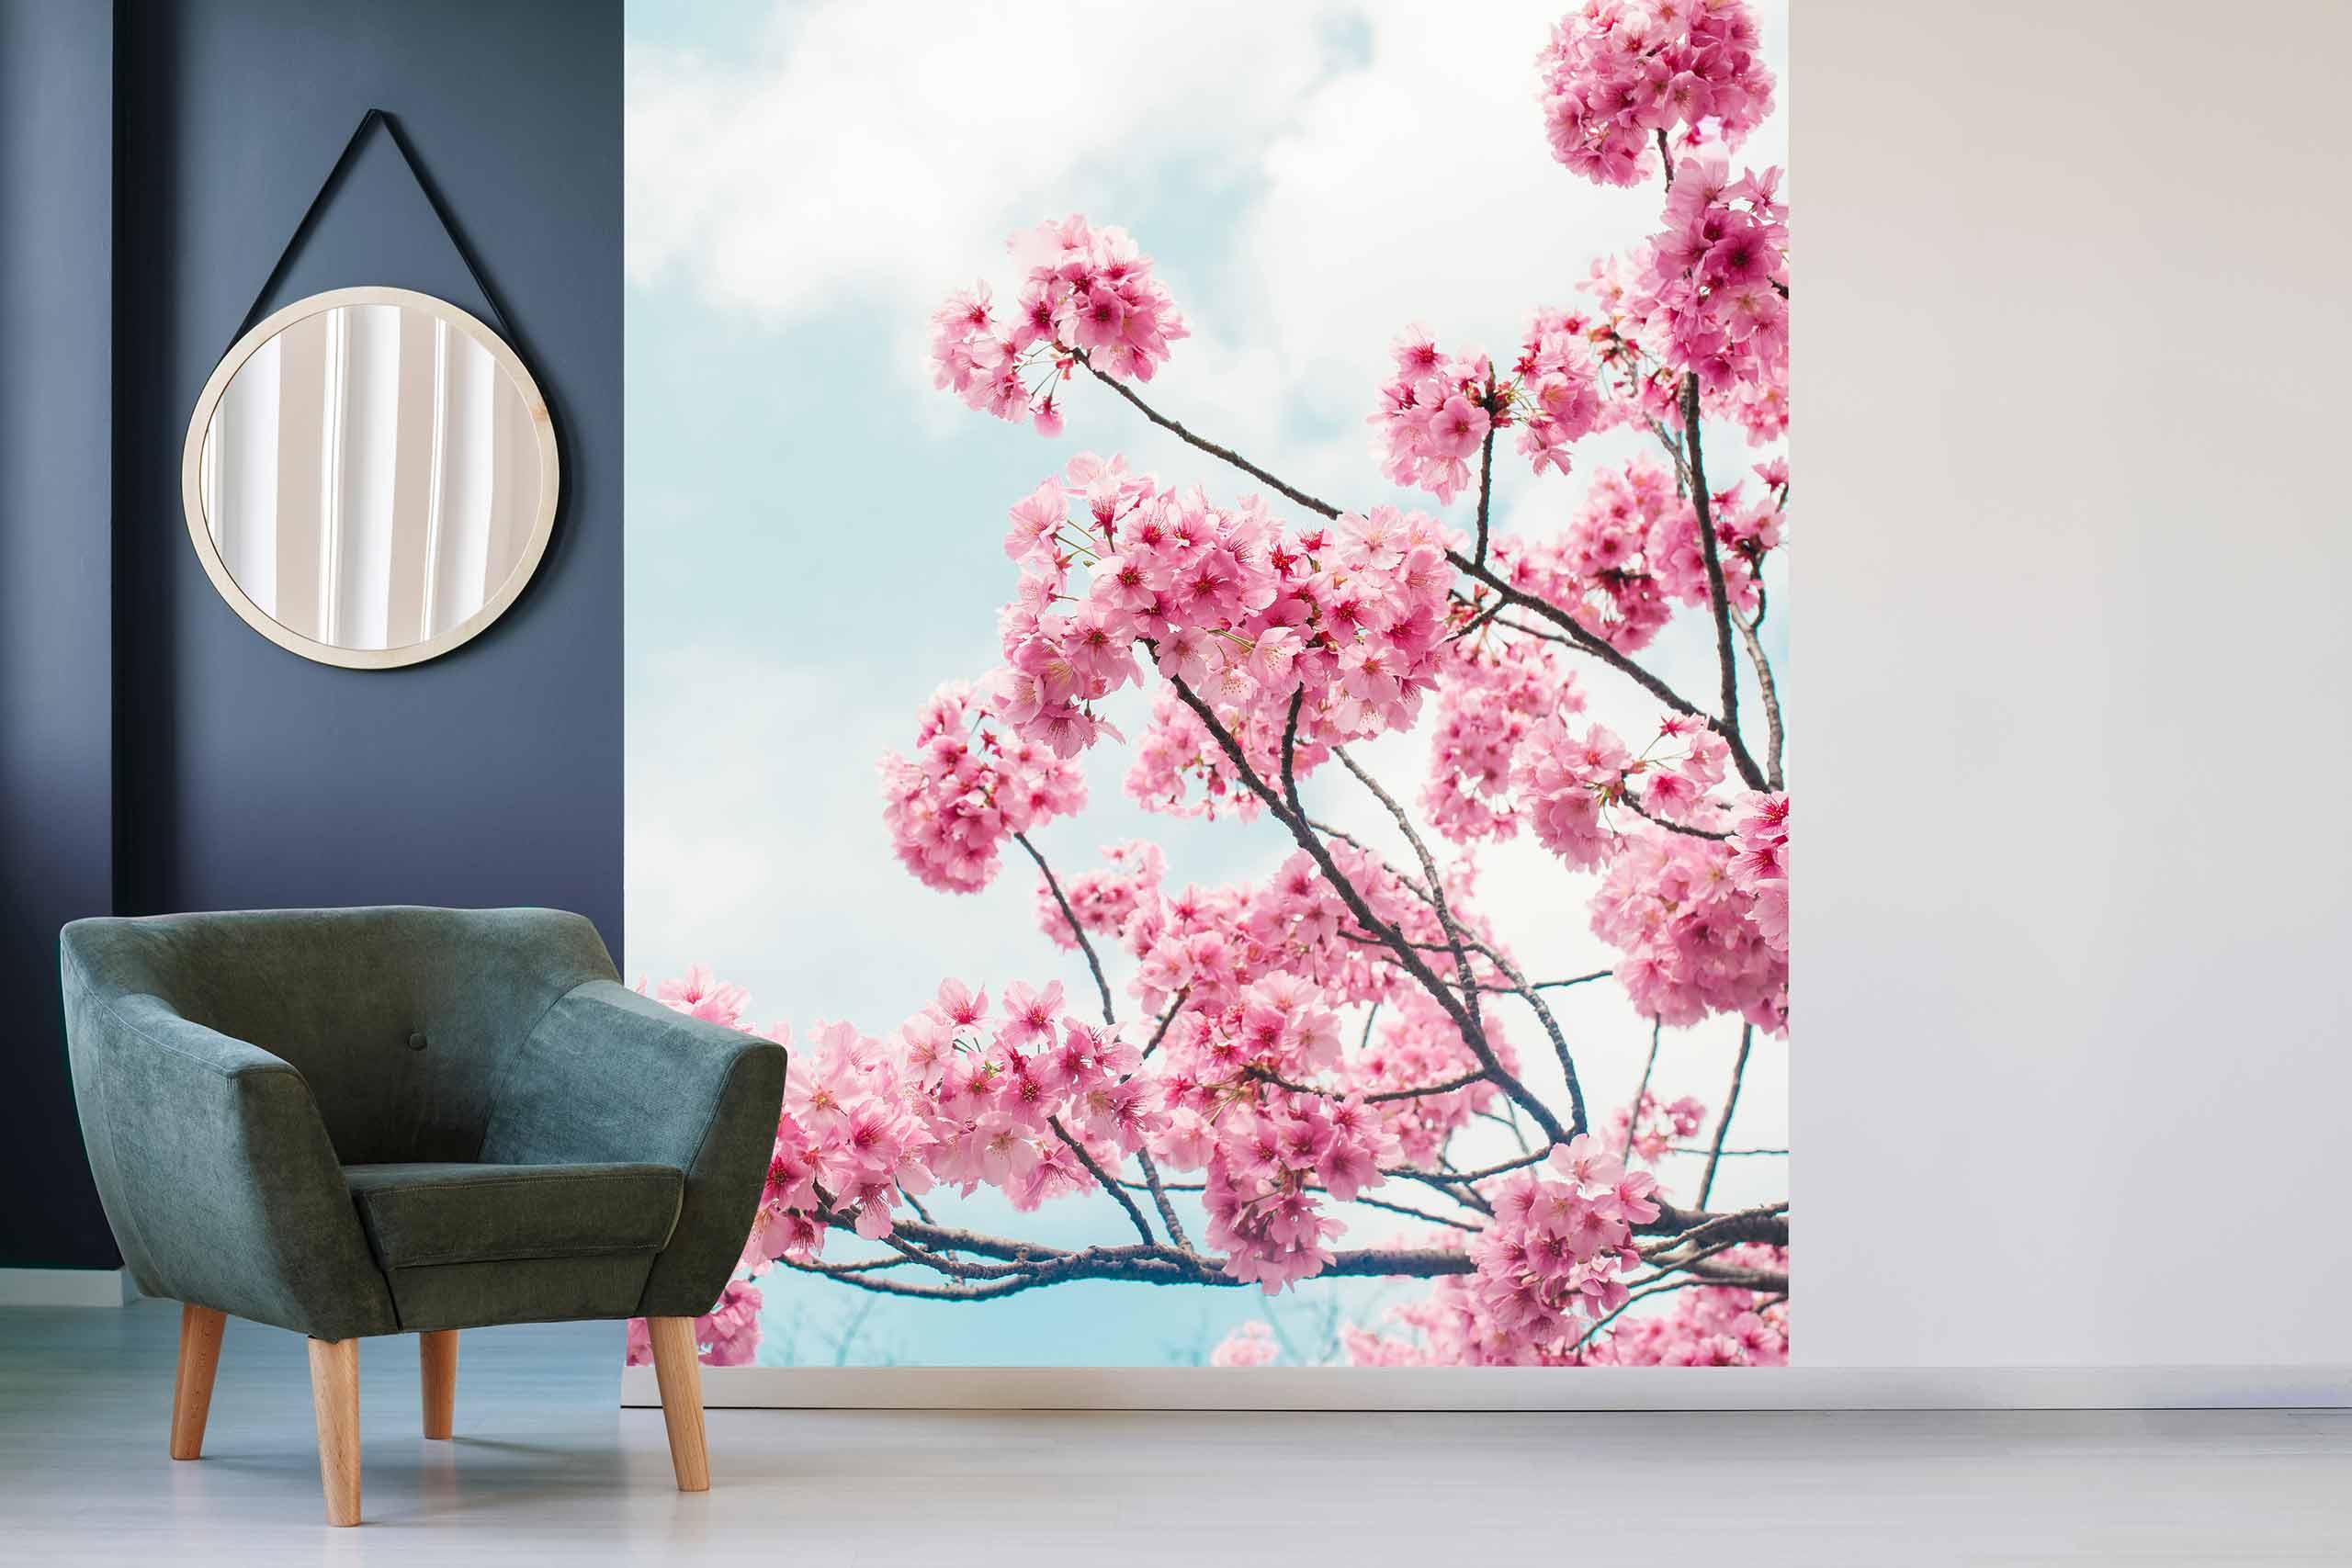 Vlies Tapete 225 Fototapete Höhe 250cm Motiv 111 Blüten Baum